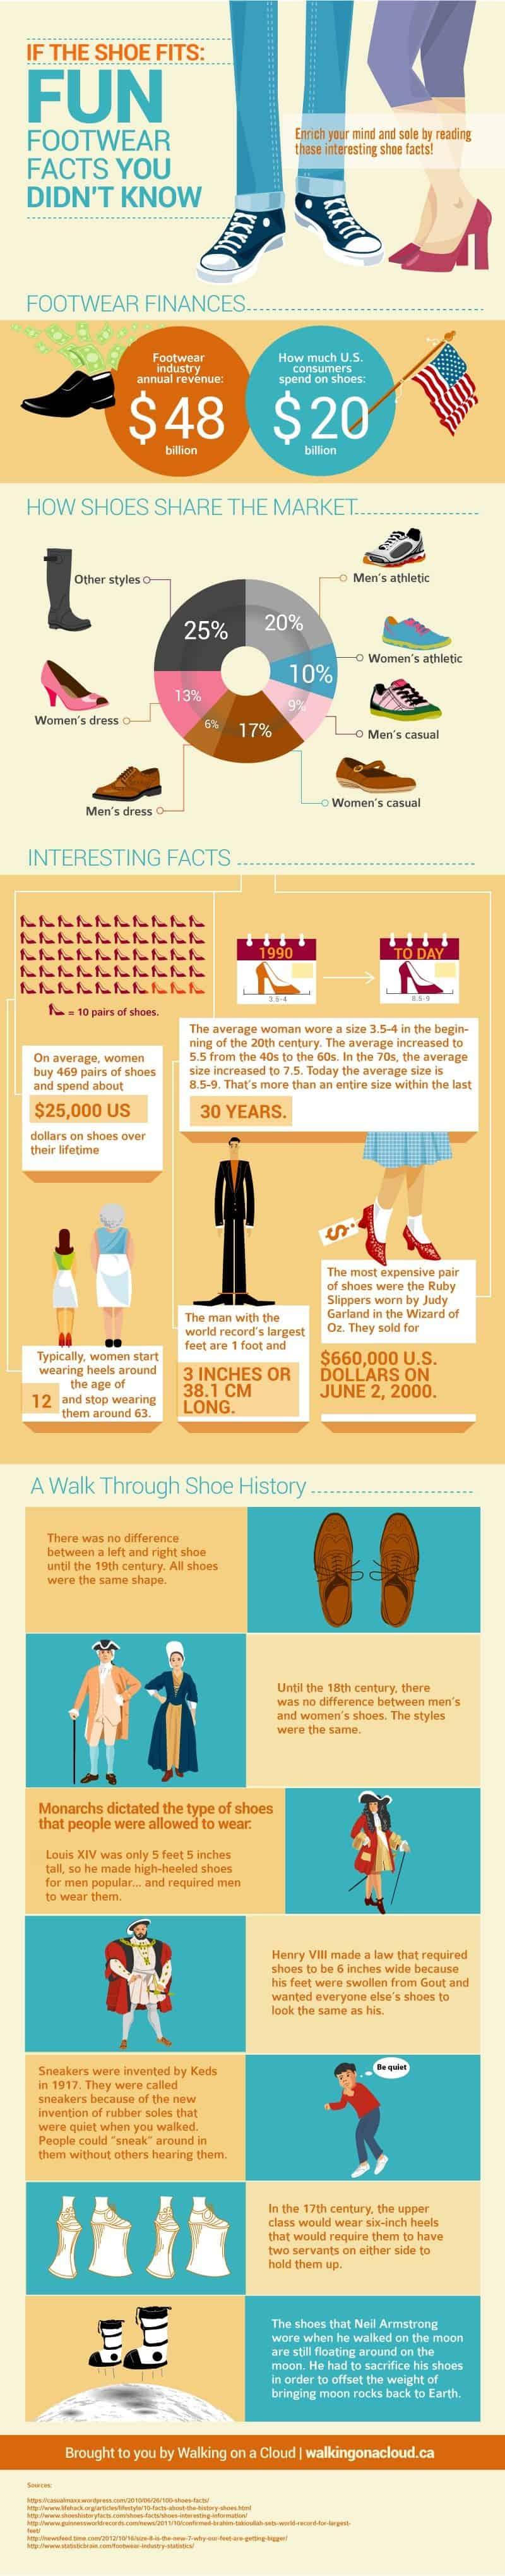 Interesting Footwear Facts